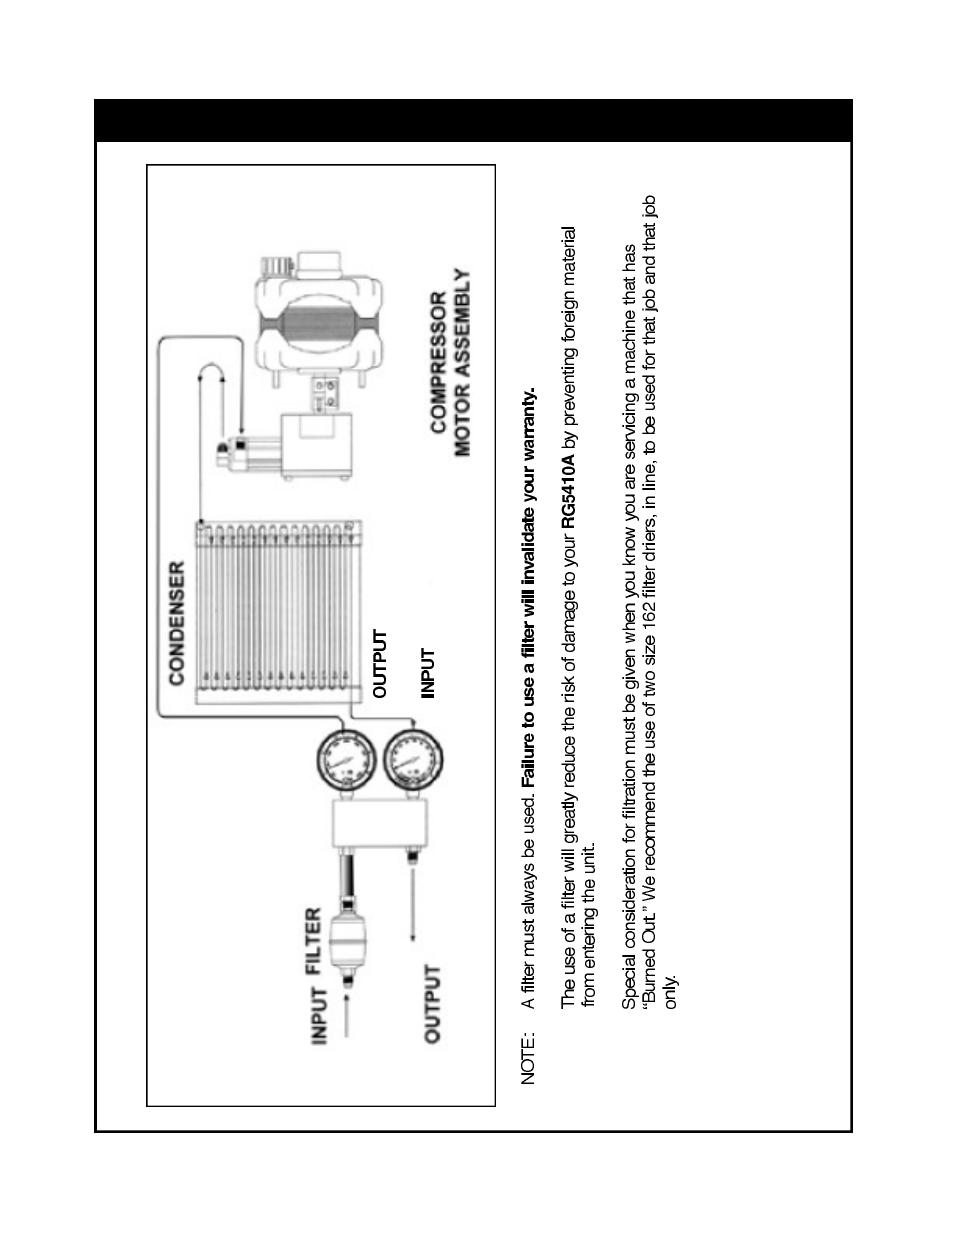 Refrigerant flow diagram | TIF RG5410A Refrigerant Recovery Machine User  Manual | Page 15 / 23